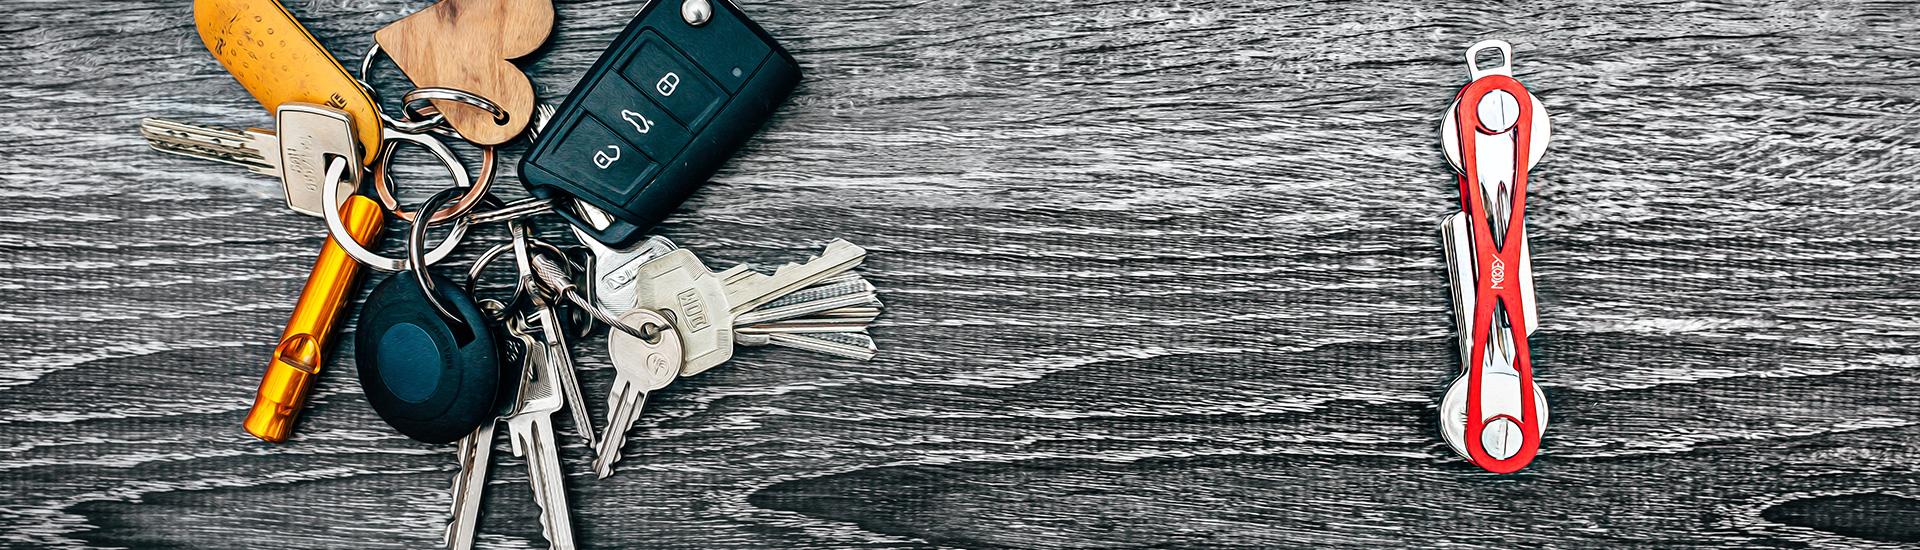 key-accessoire-gentleman